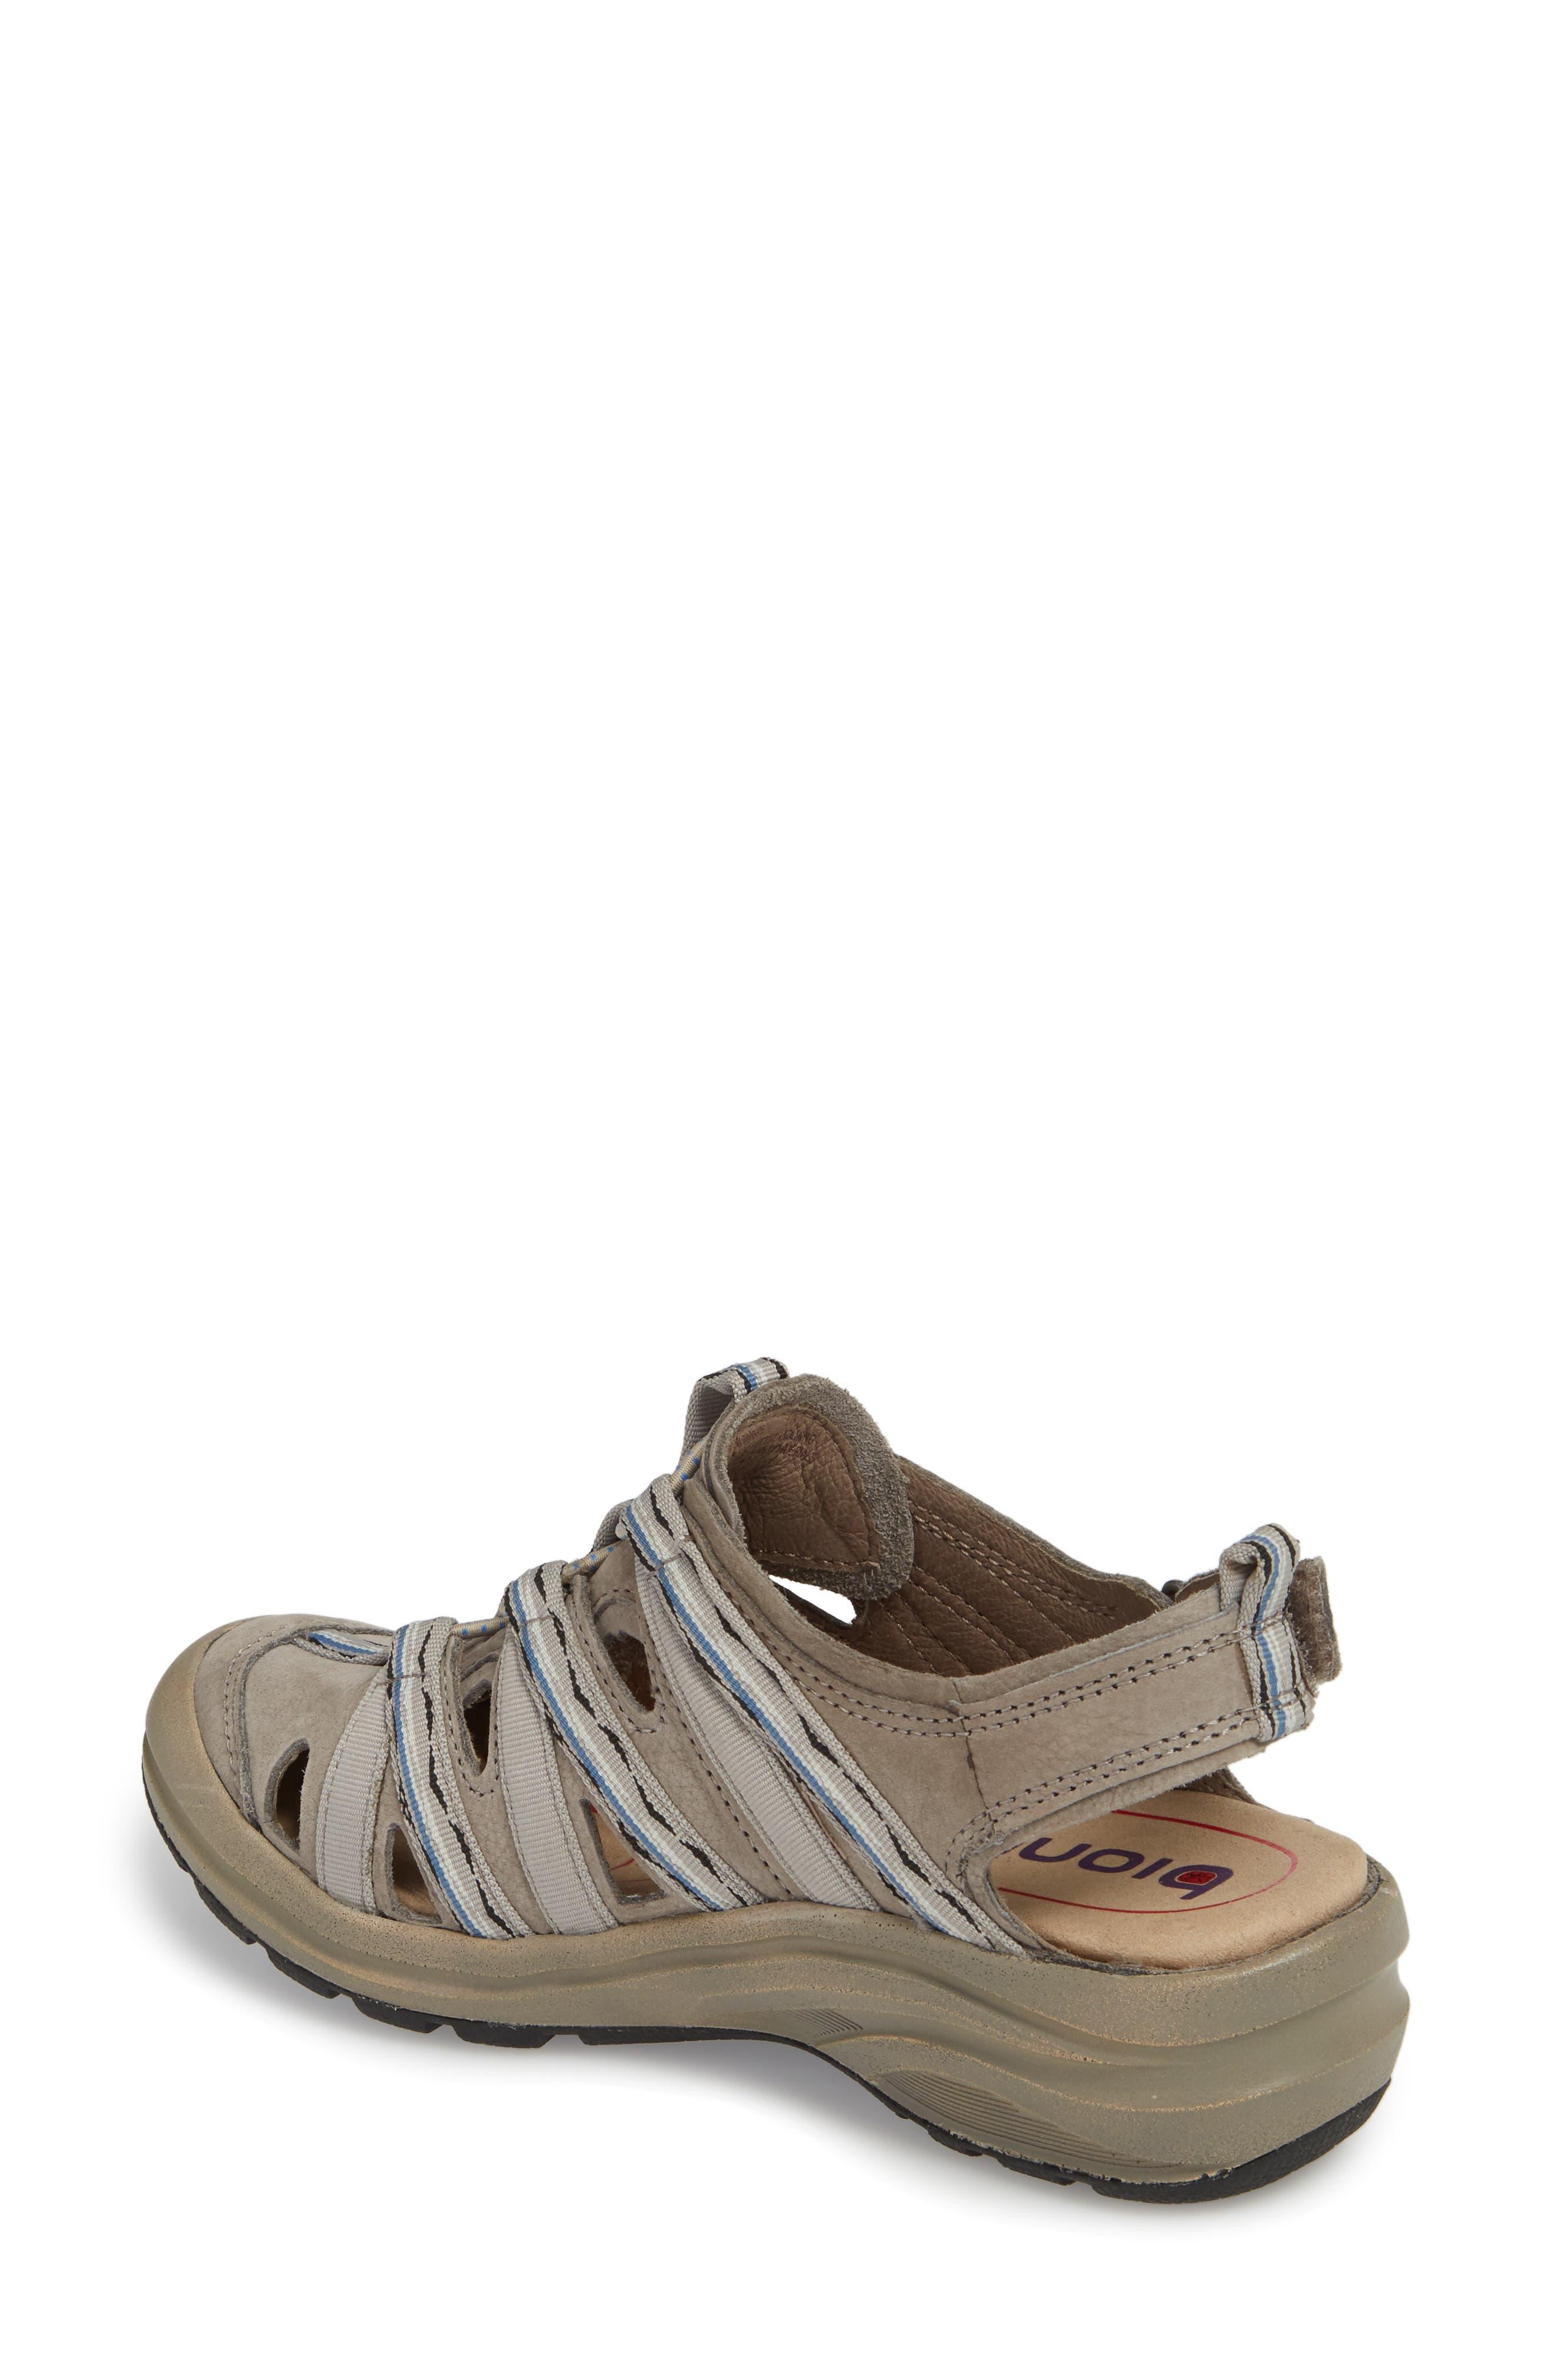 Malabar Sport Sandal,                             Alternate thumbnail 2, color,                             Paper Mache Leather